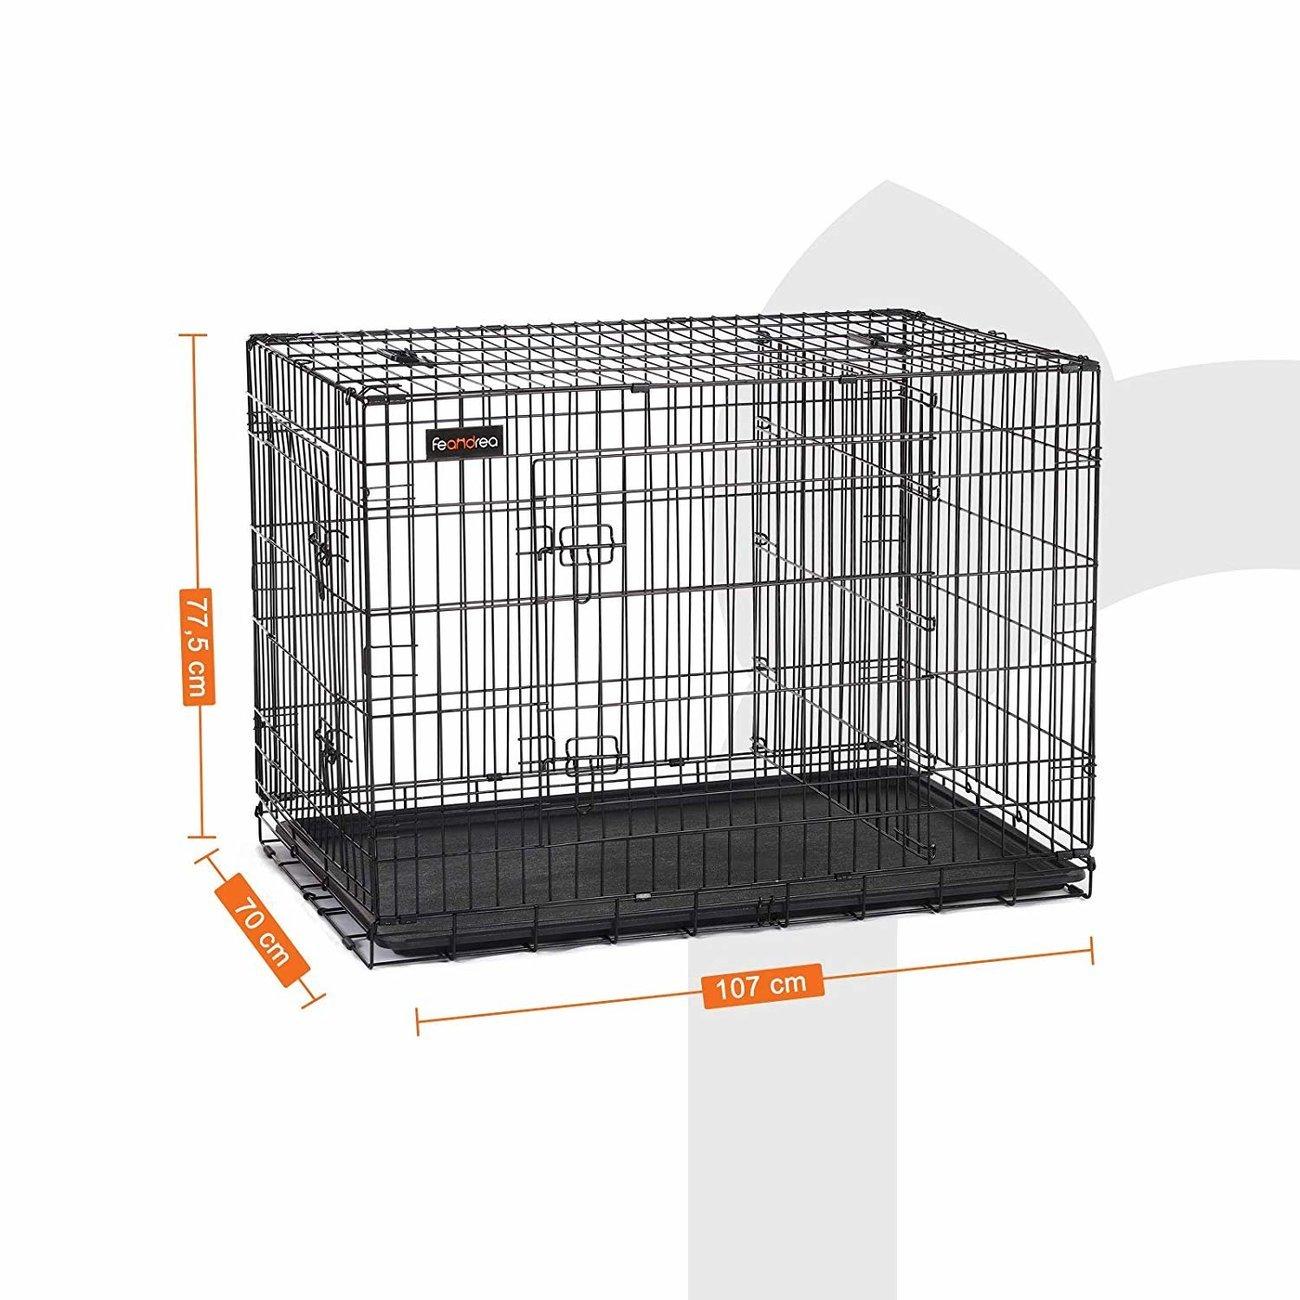 SONGMICS FEANDREA Hundekäfig, Hundebox mit Trennwand, 2 Türen, 107 x 70 x 77.5 cm (L x B x H)